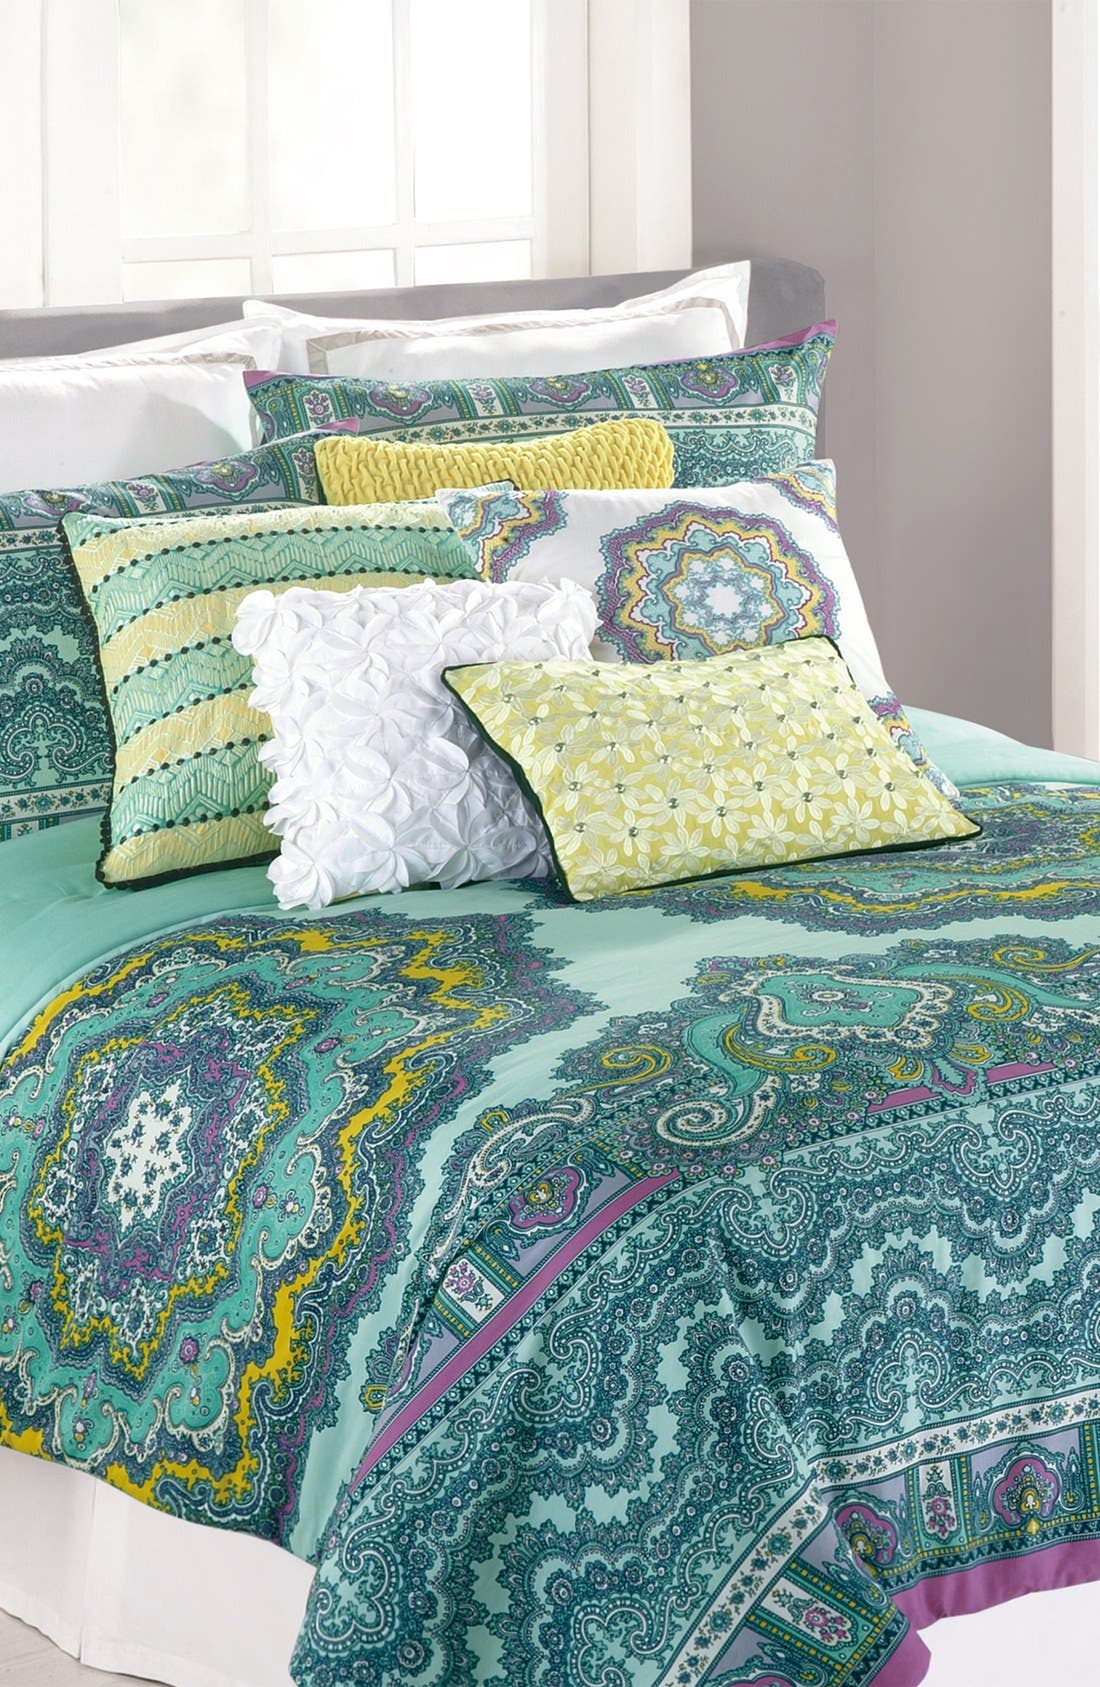 Alternate Image 1 Selected - Nanette Lepore Villa 'Paisley Medallion' Cotton Comforter Set